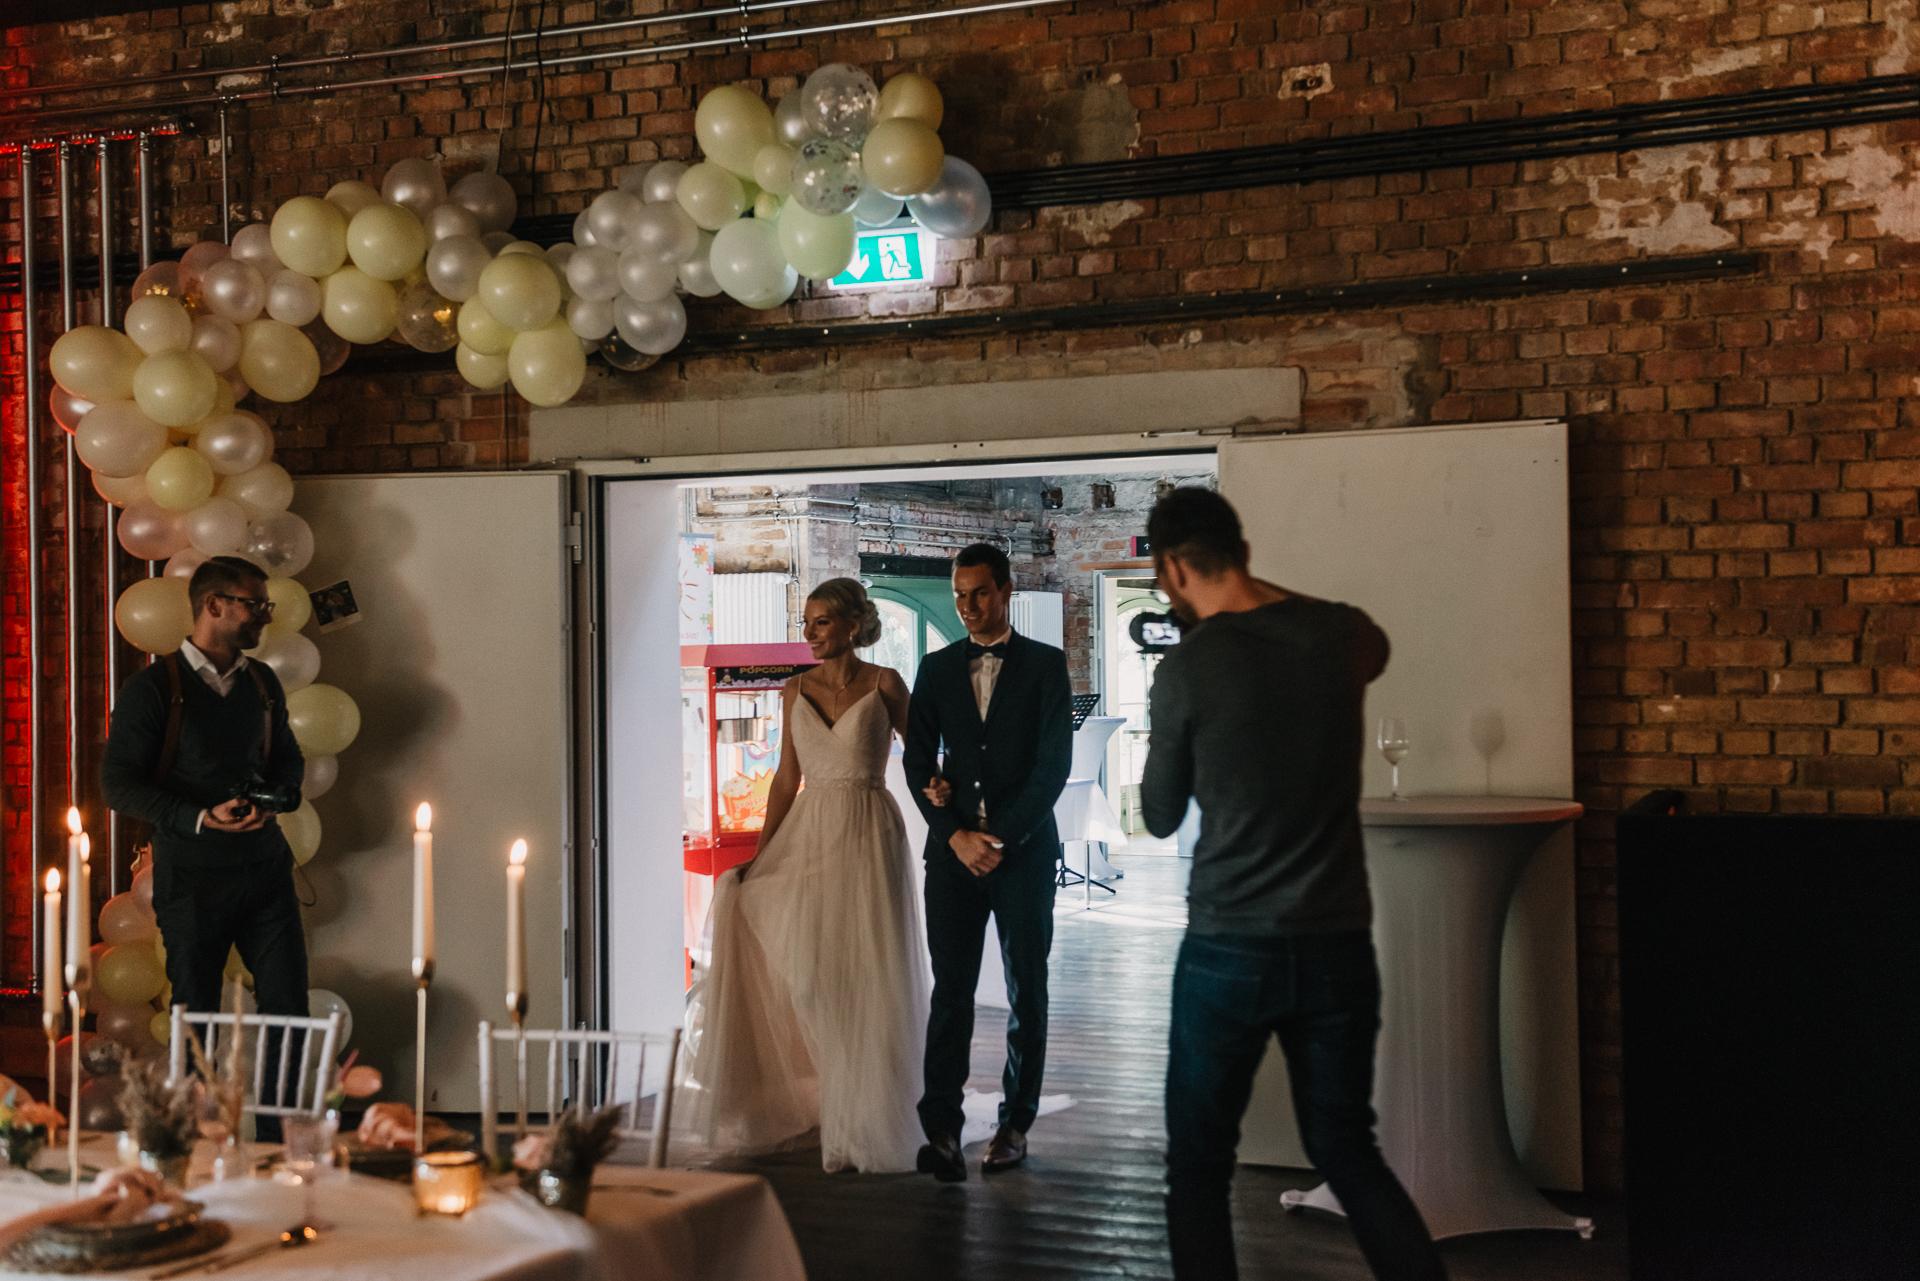 Zweinander-LeonoreHerzog-WeddingMarket-OnTour20191110-8843